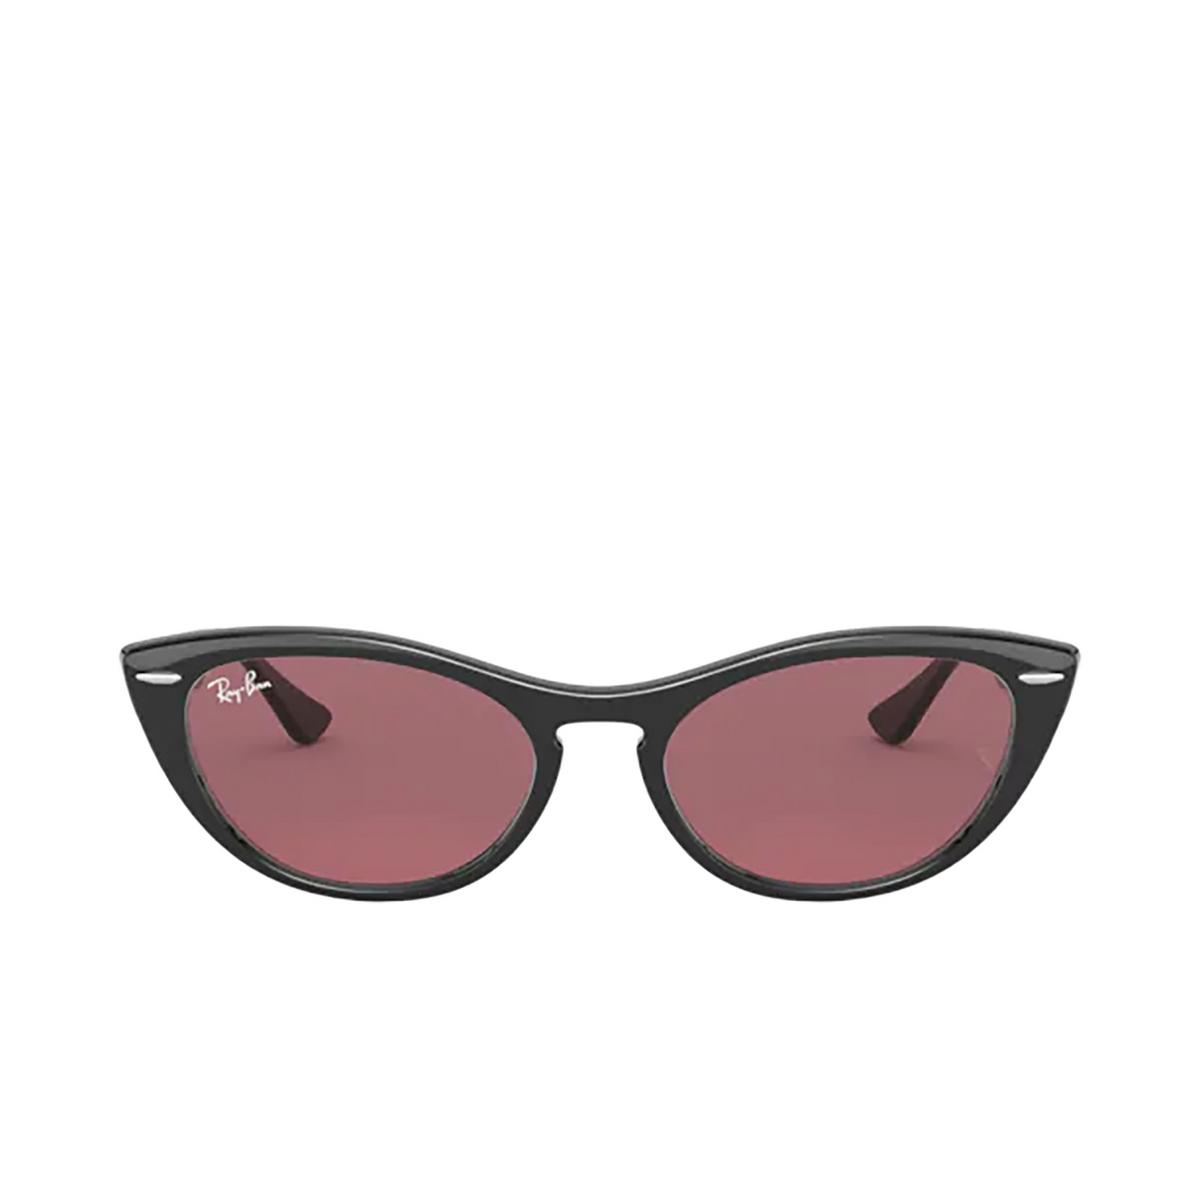 Ray-Ban® Cat-eye Sunglasses: Nina RB4314N color Black 601/U0 - 1/3.